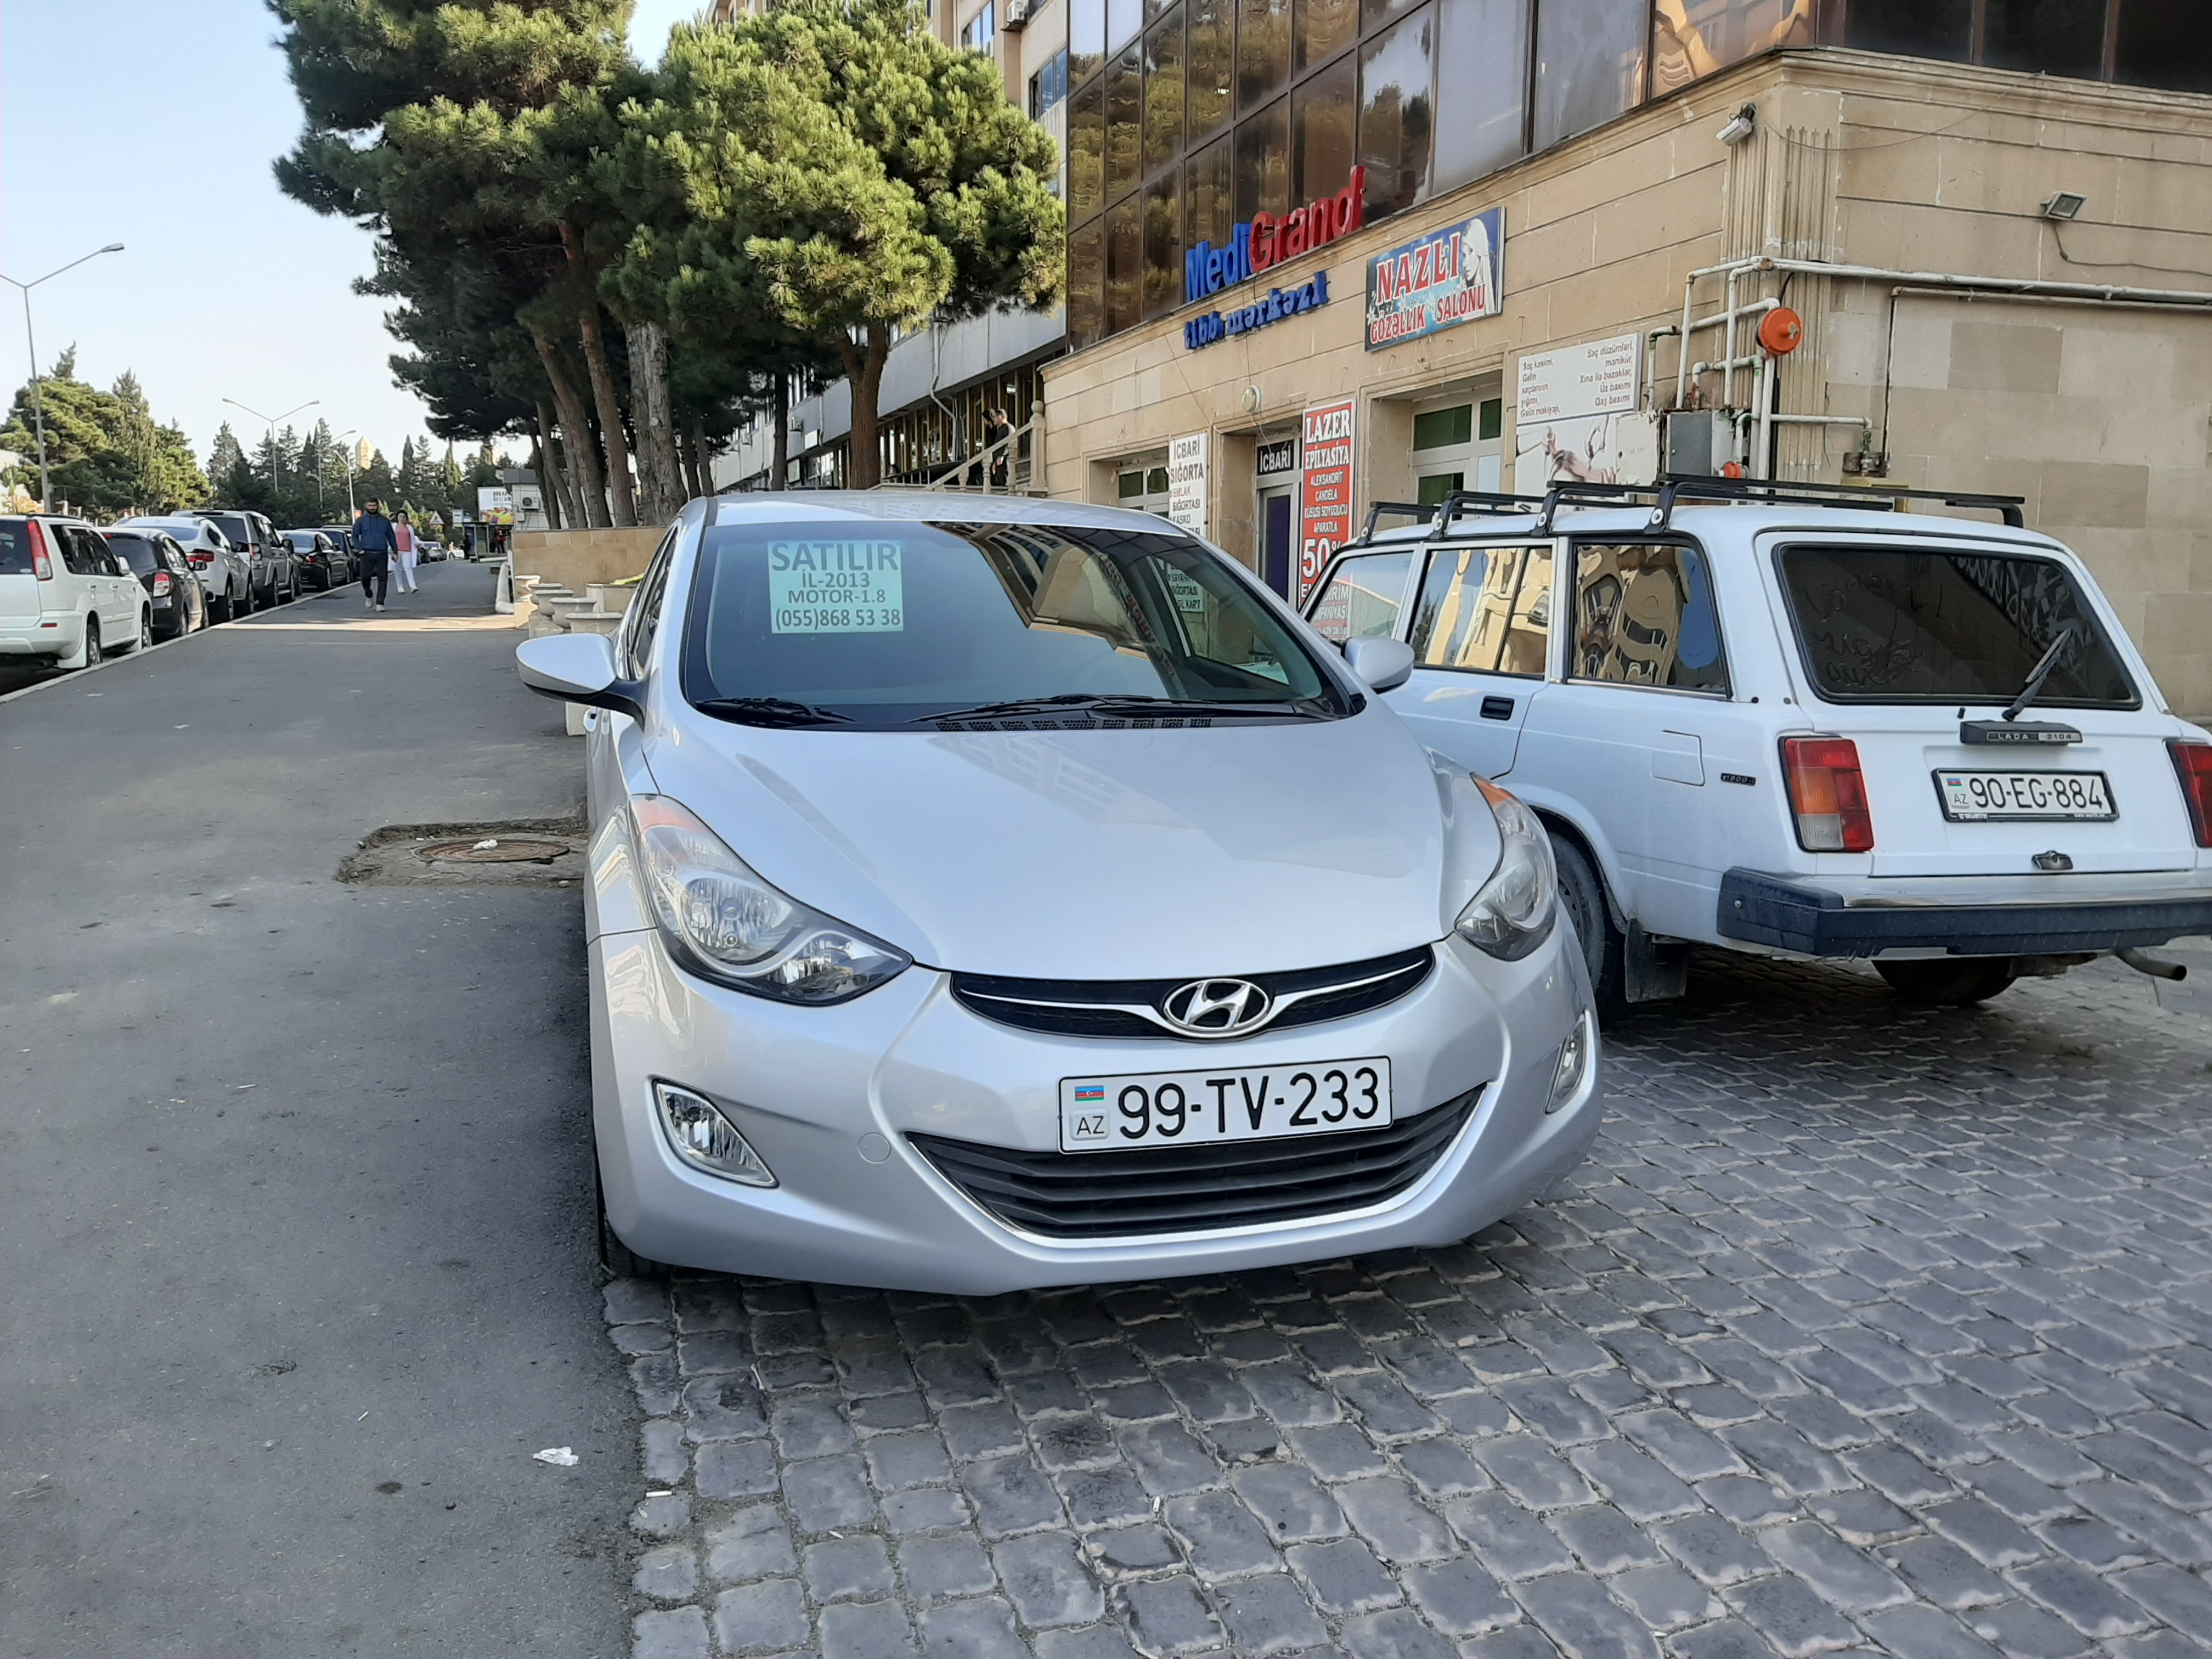 Hyundai Elantra 1.8(lt) 2013 İkinci əl  $11200